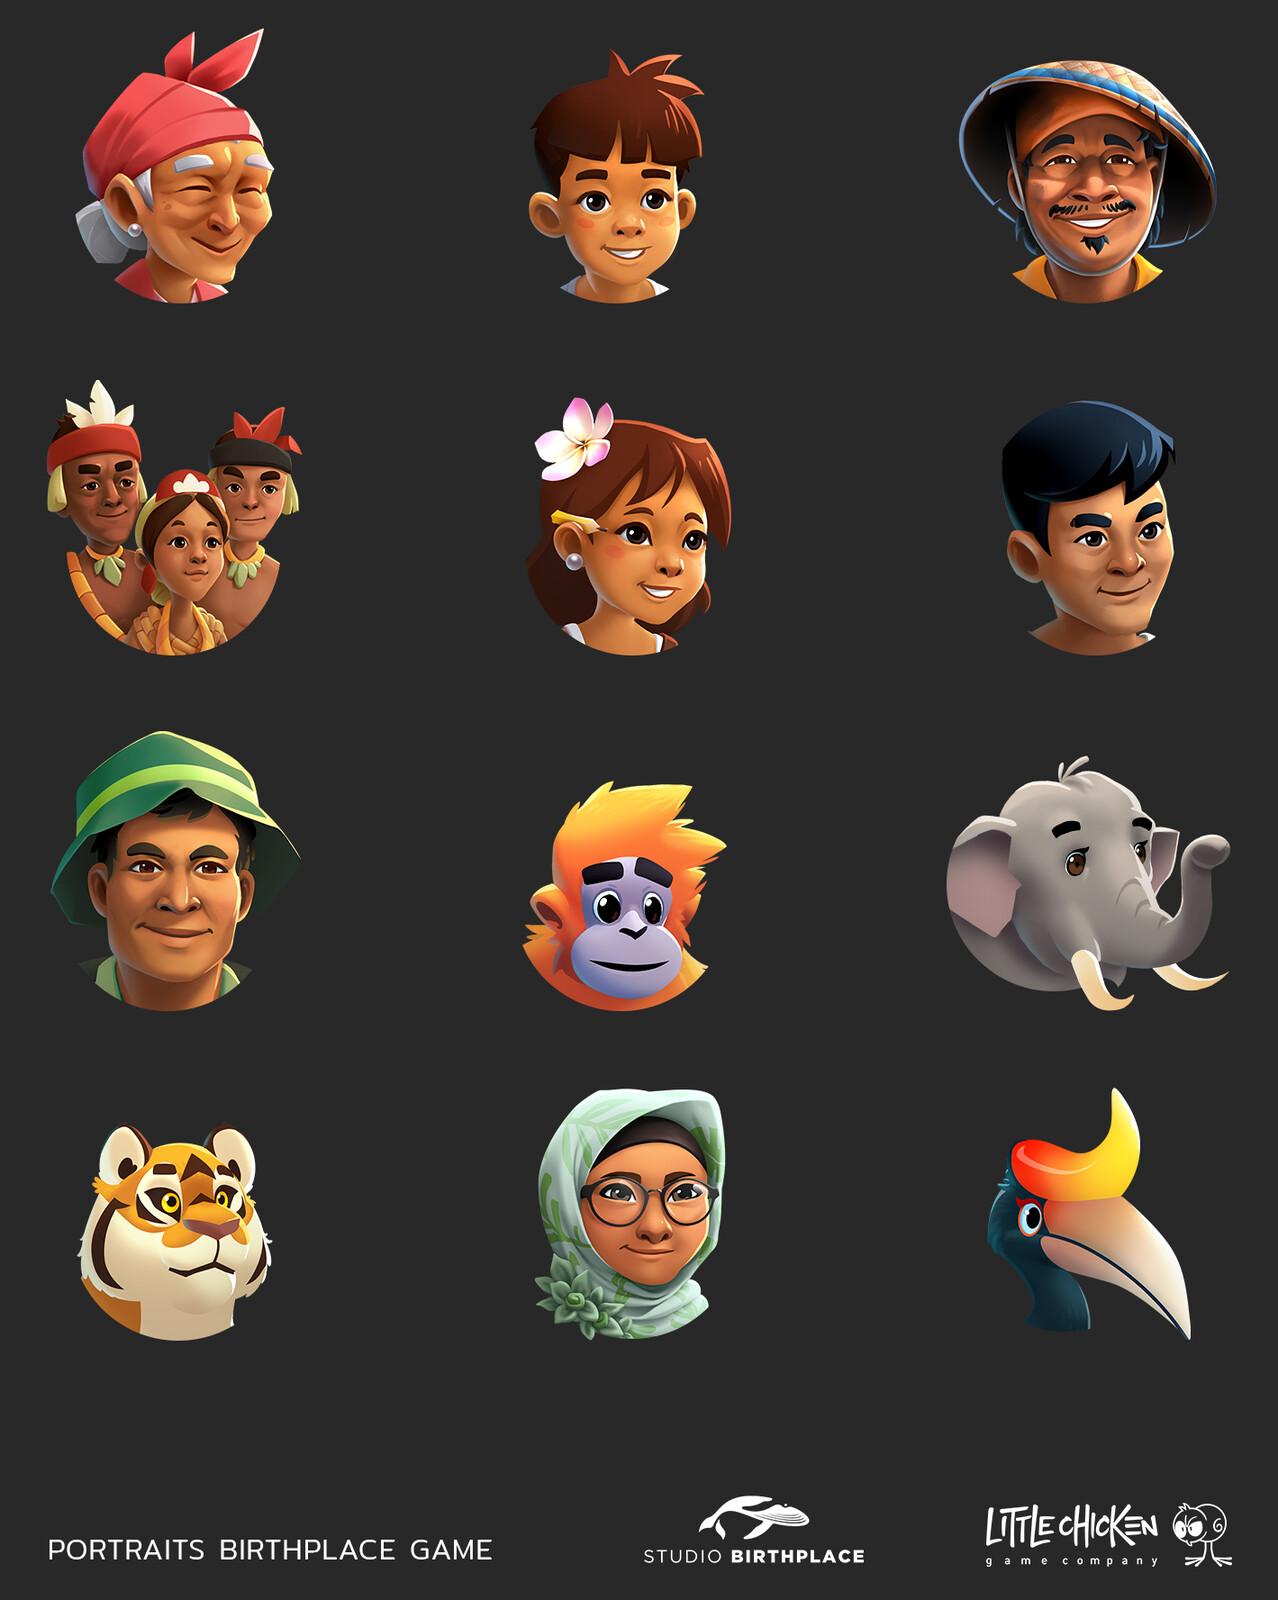 Character portraits